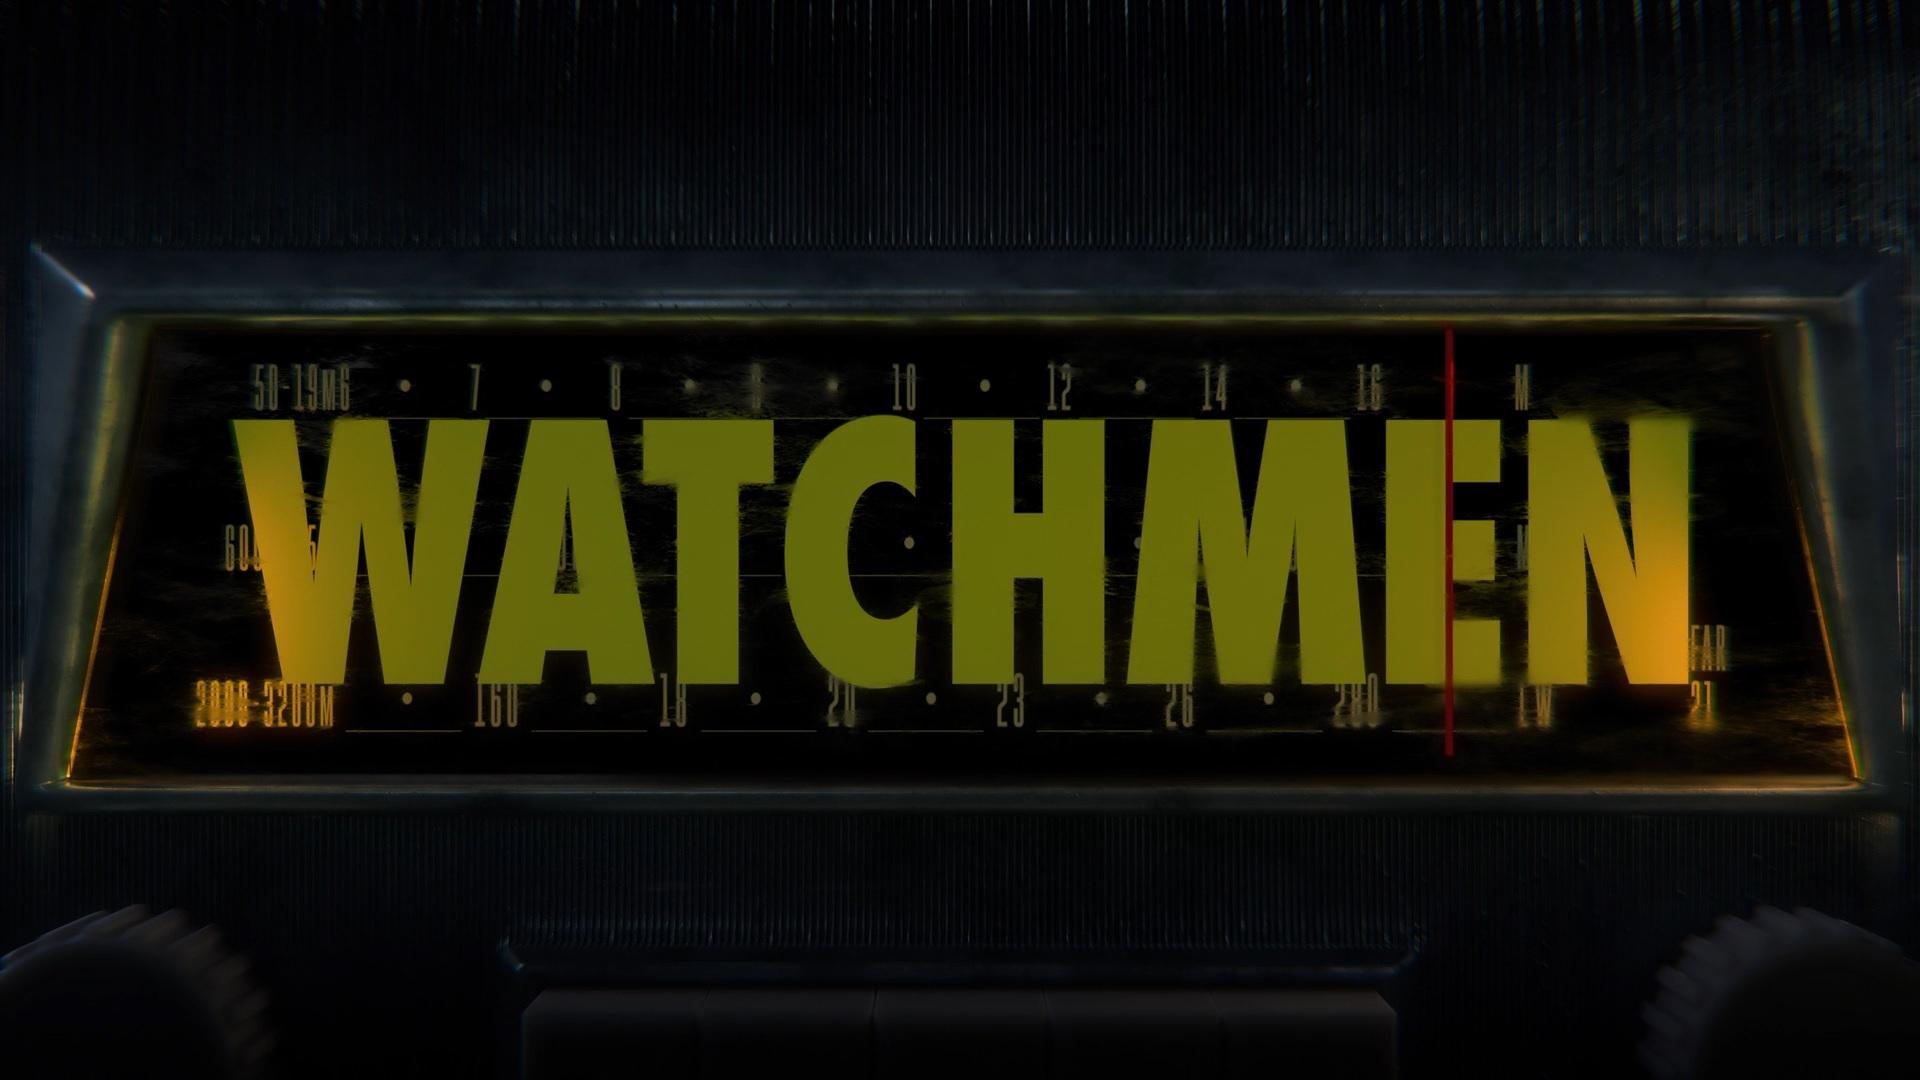 Watchmen (TV Series) Episode: Little Fear of Lightning